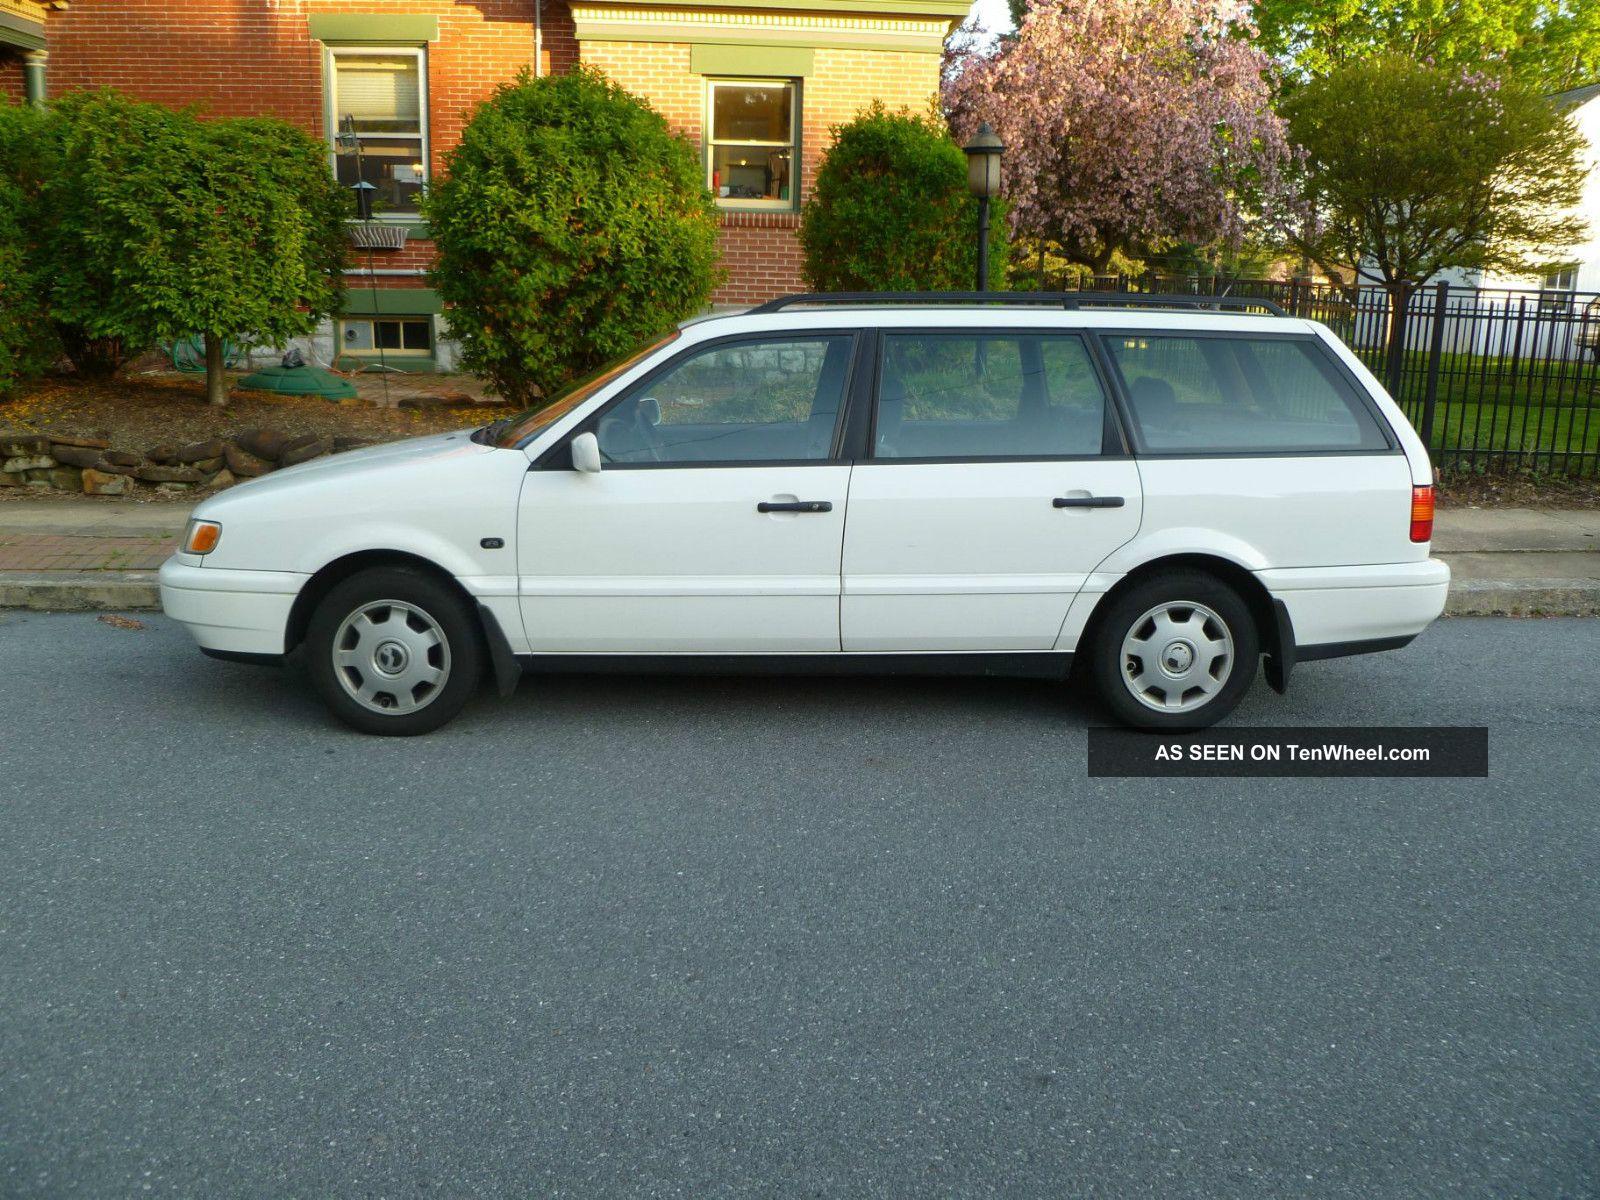 rare 1996 volkswagen passat tdi wagon 4 door 1 9l 2013 Honda Accord 2.4L 2015 Honda Accord Coupe Interior